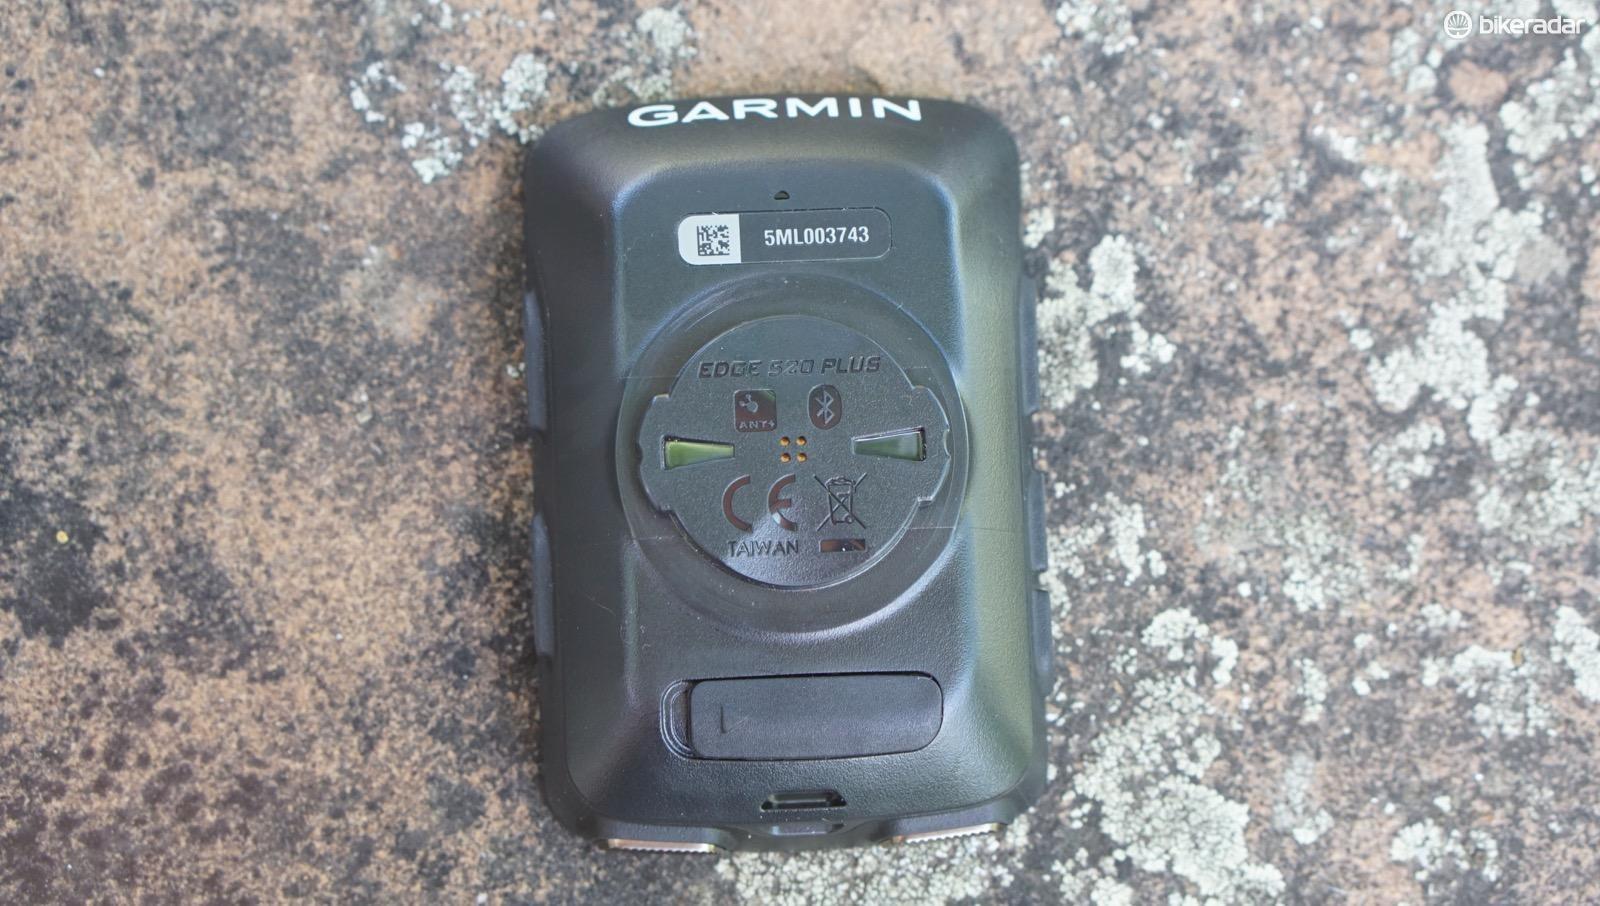 ANT+? Check. Bluetooth? Check. WiFi? Negative